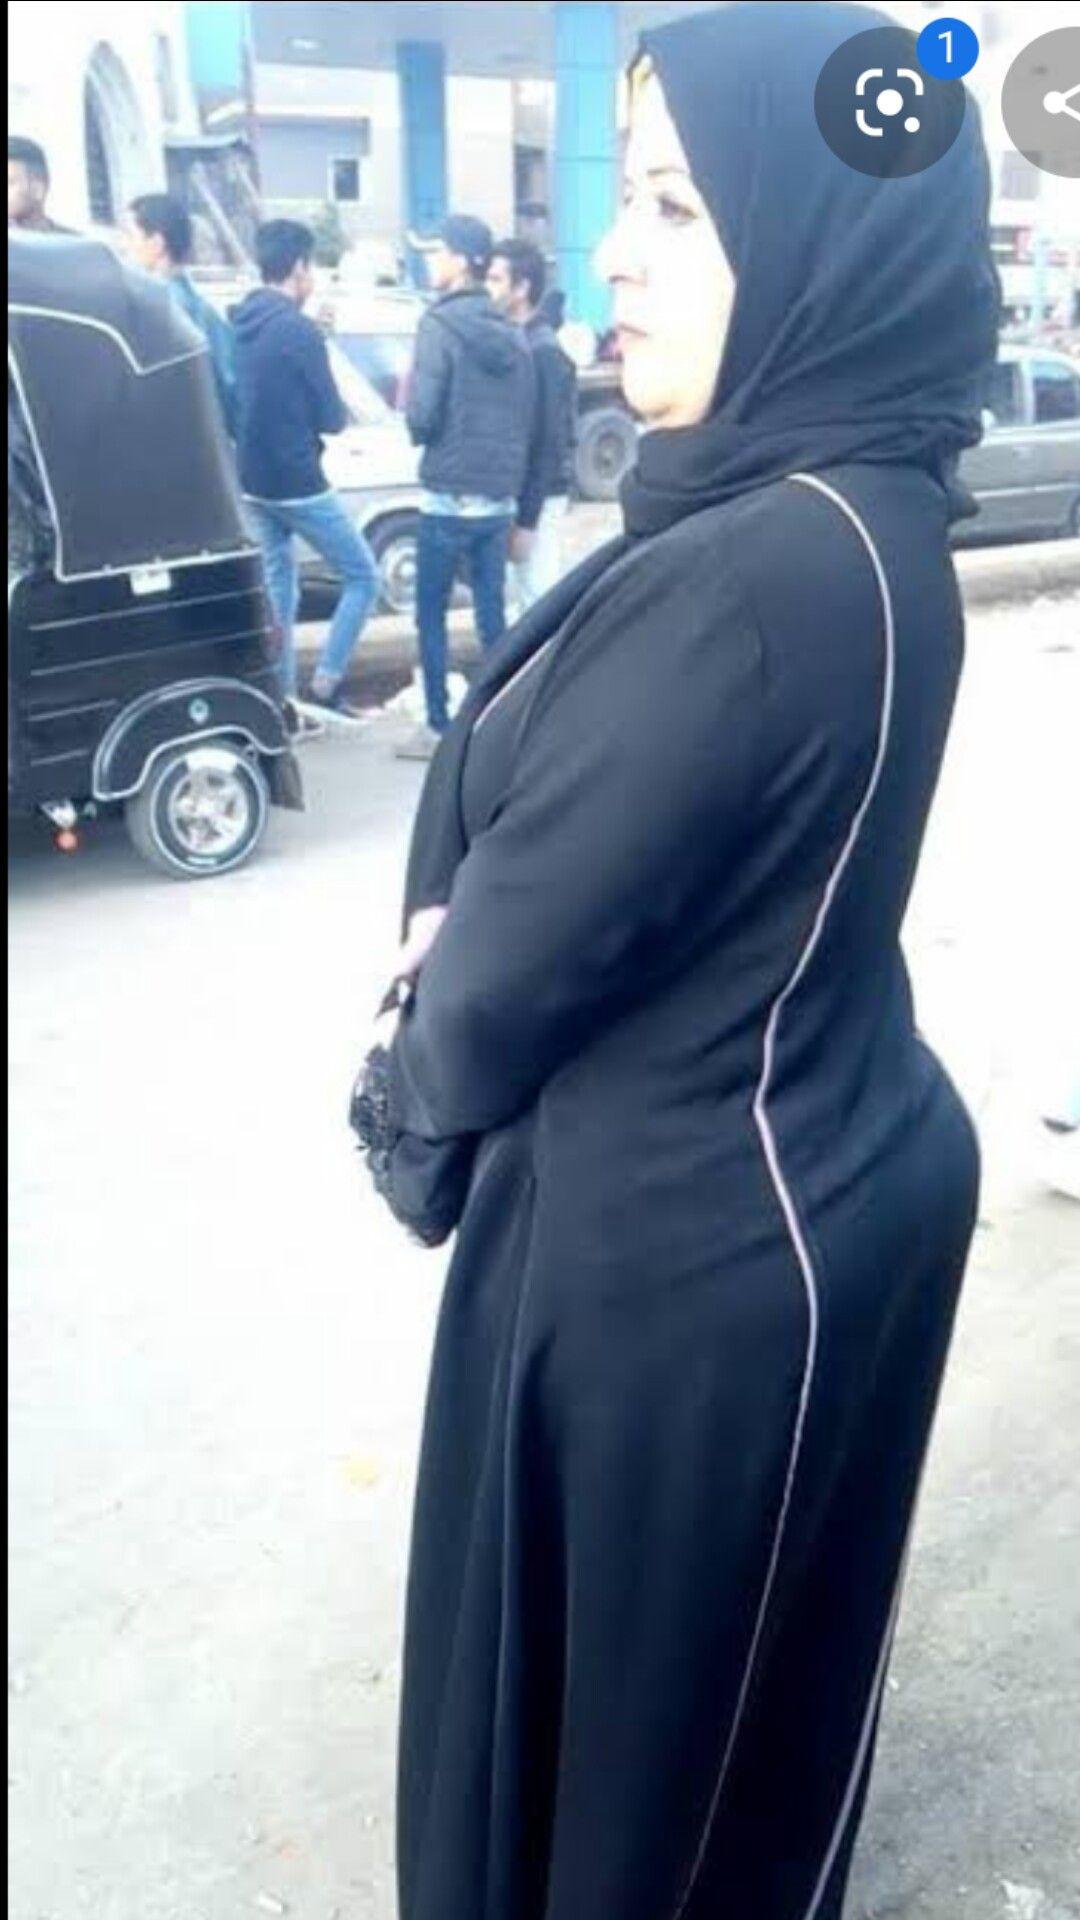 Pin By Abdo Kech On Humour In 2020  Arab Girls Hijab -1772